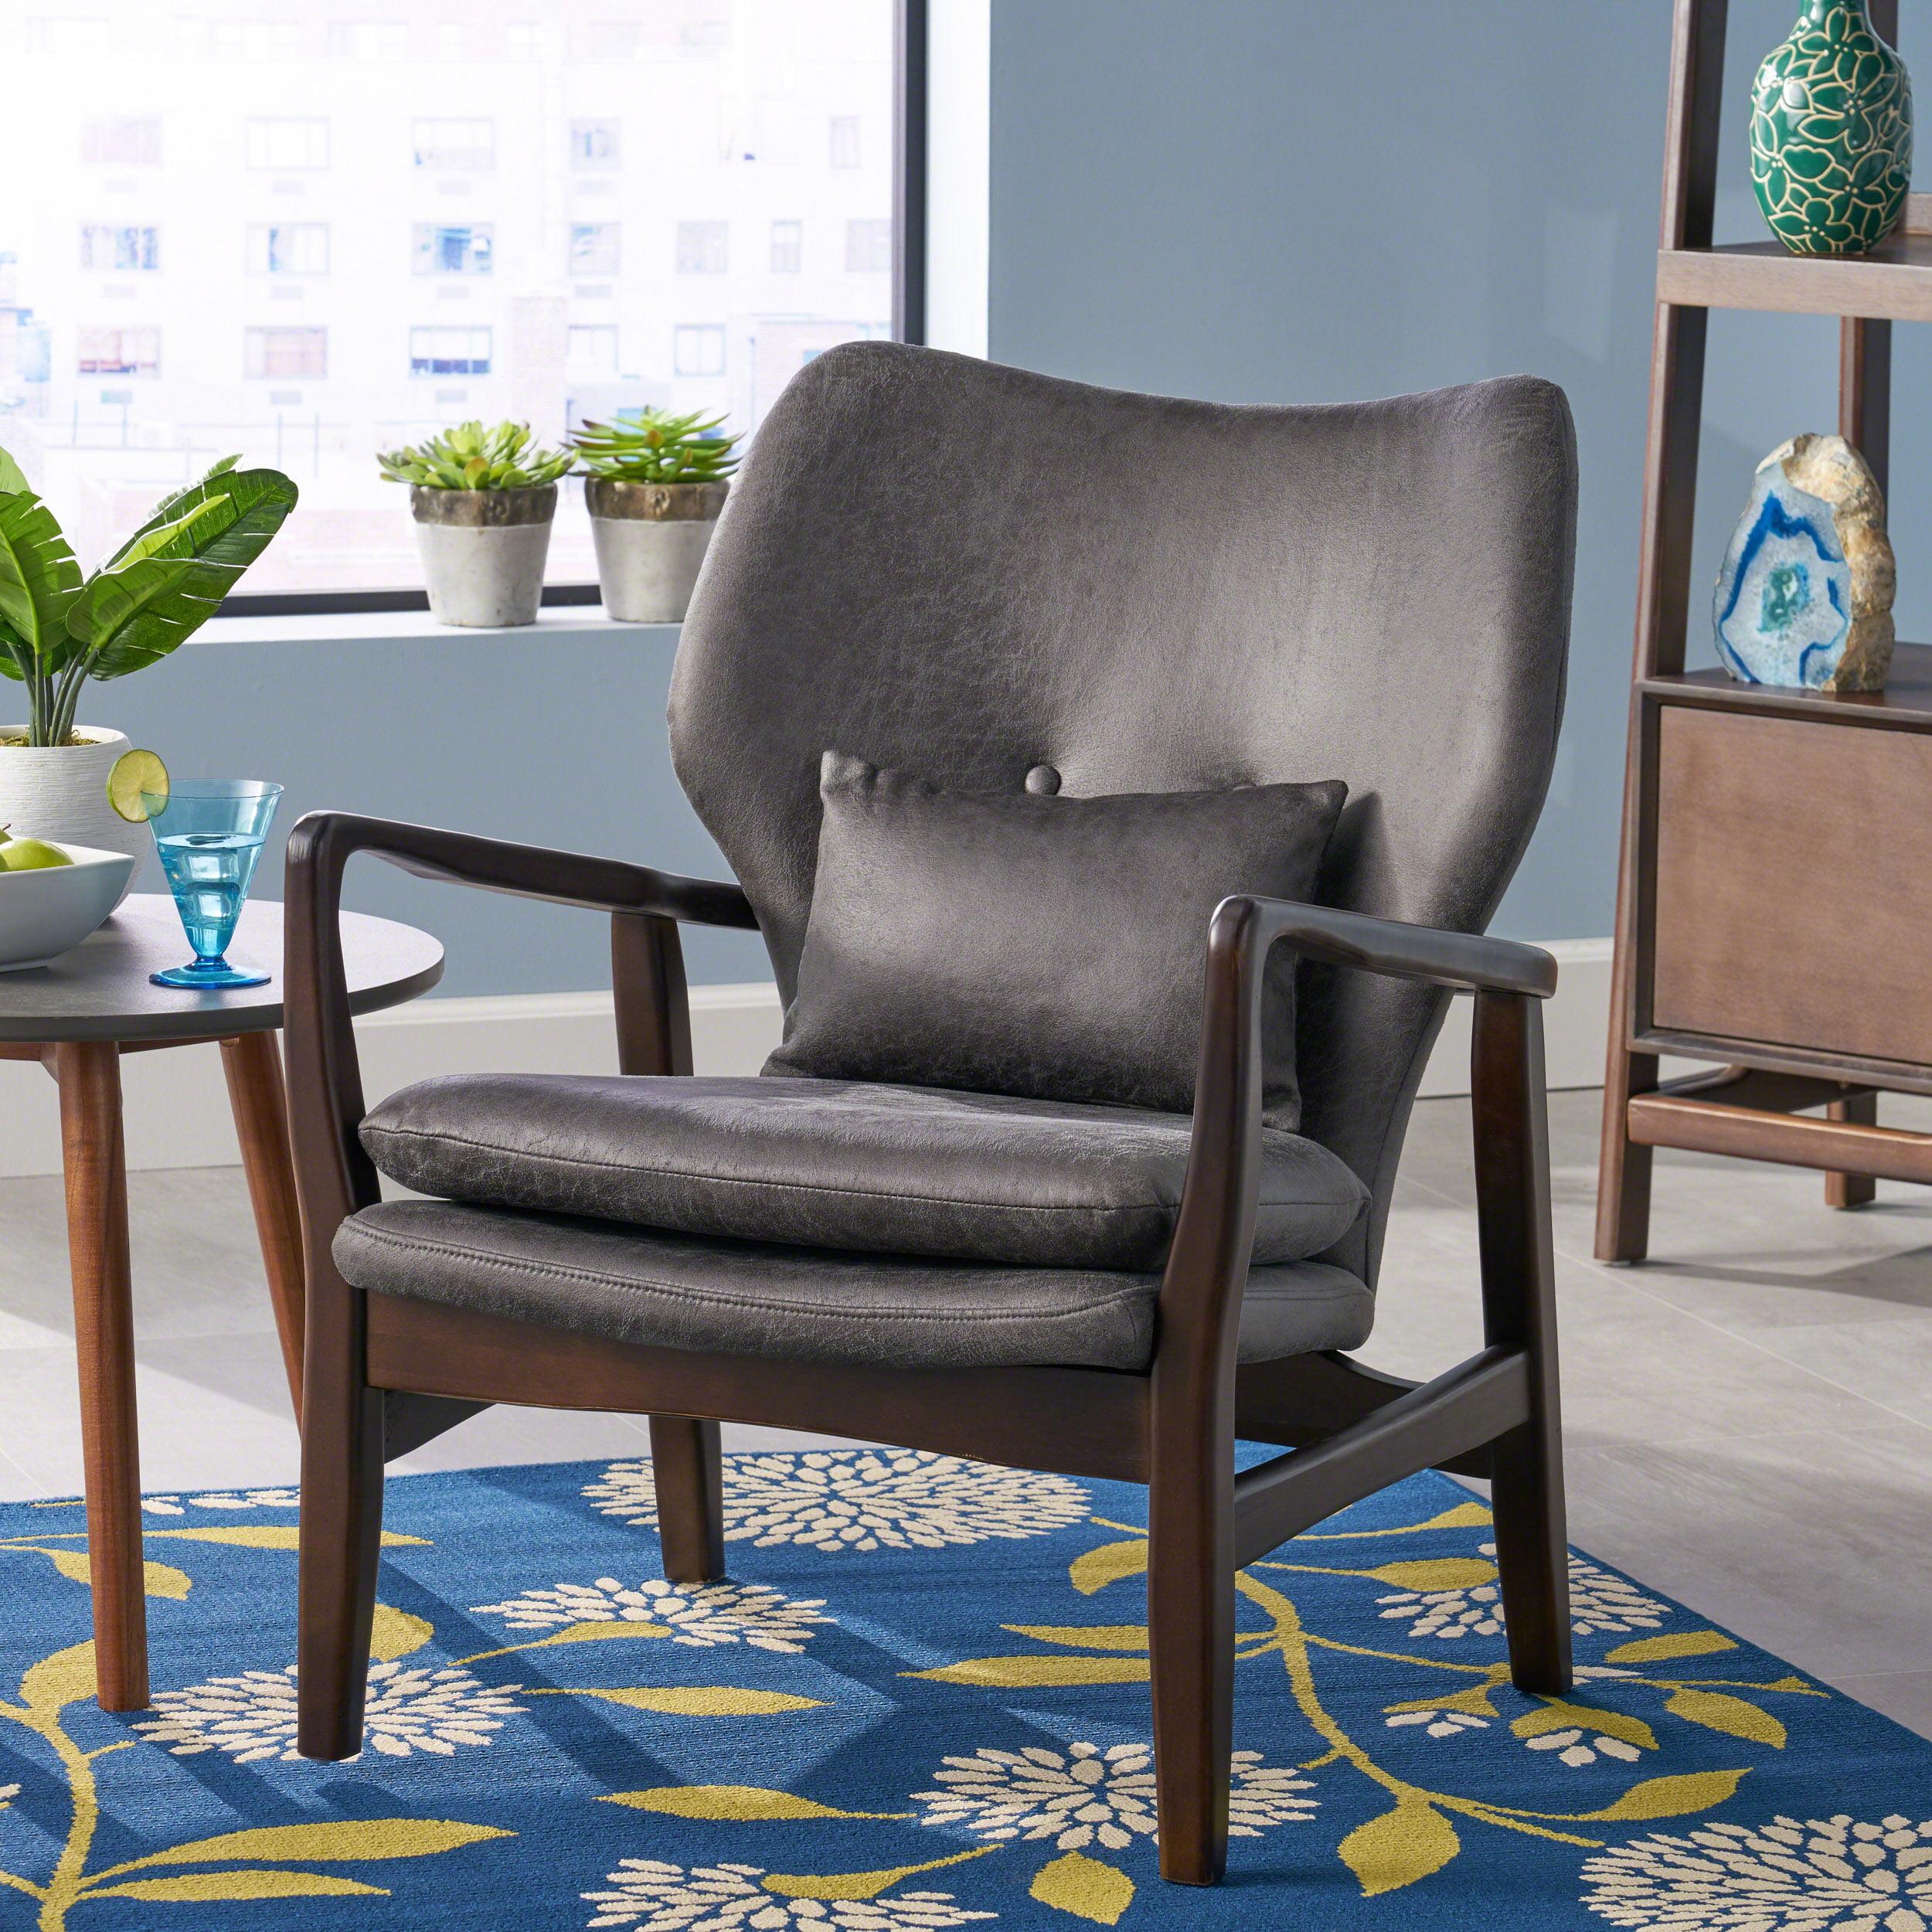 Noble House Mid Century Modern Microfiber Club Chair, Slate